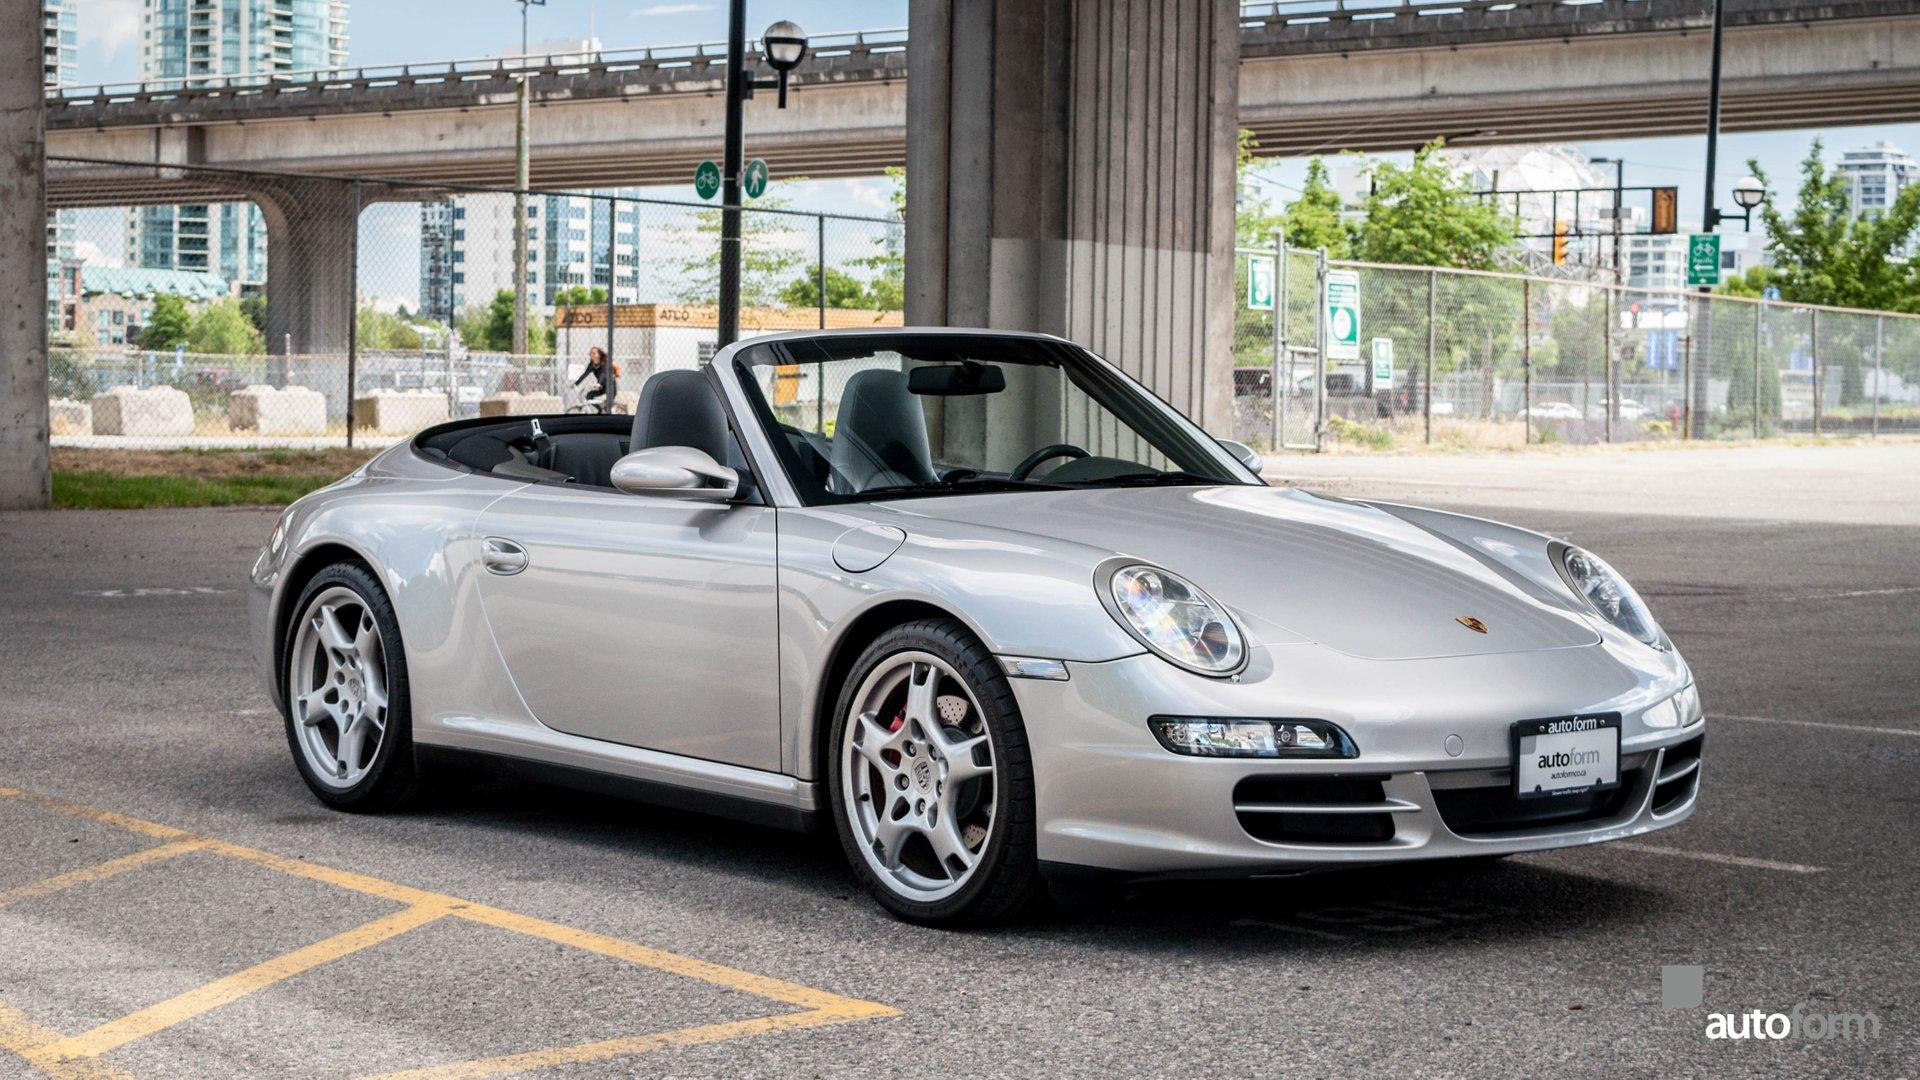 2006 porsche 911 c4s manual transmission